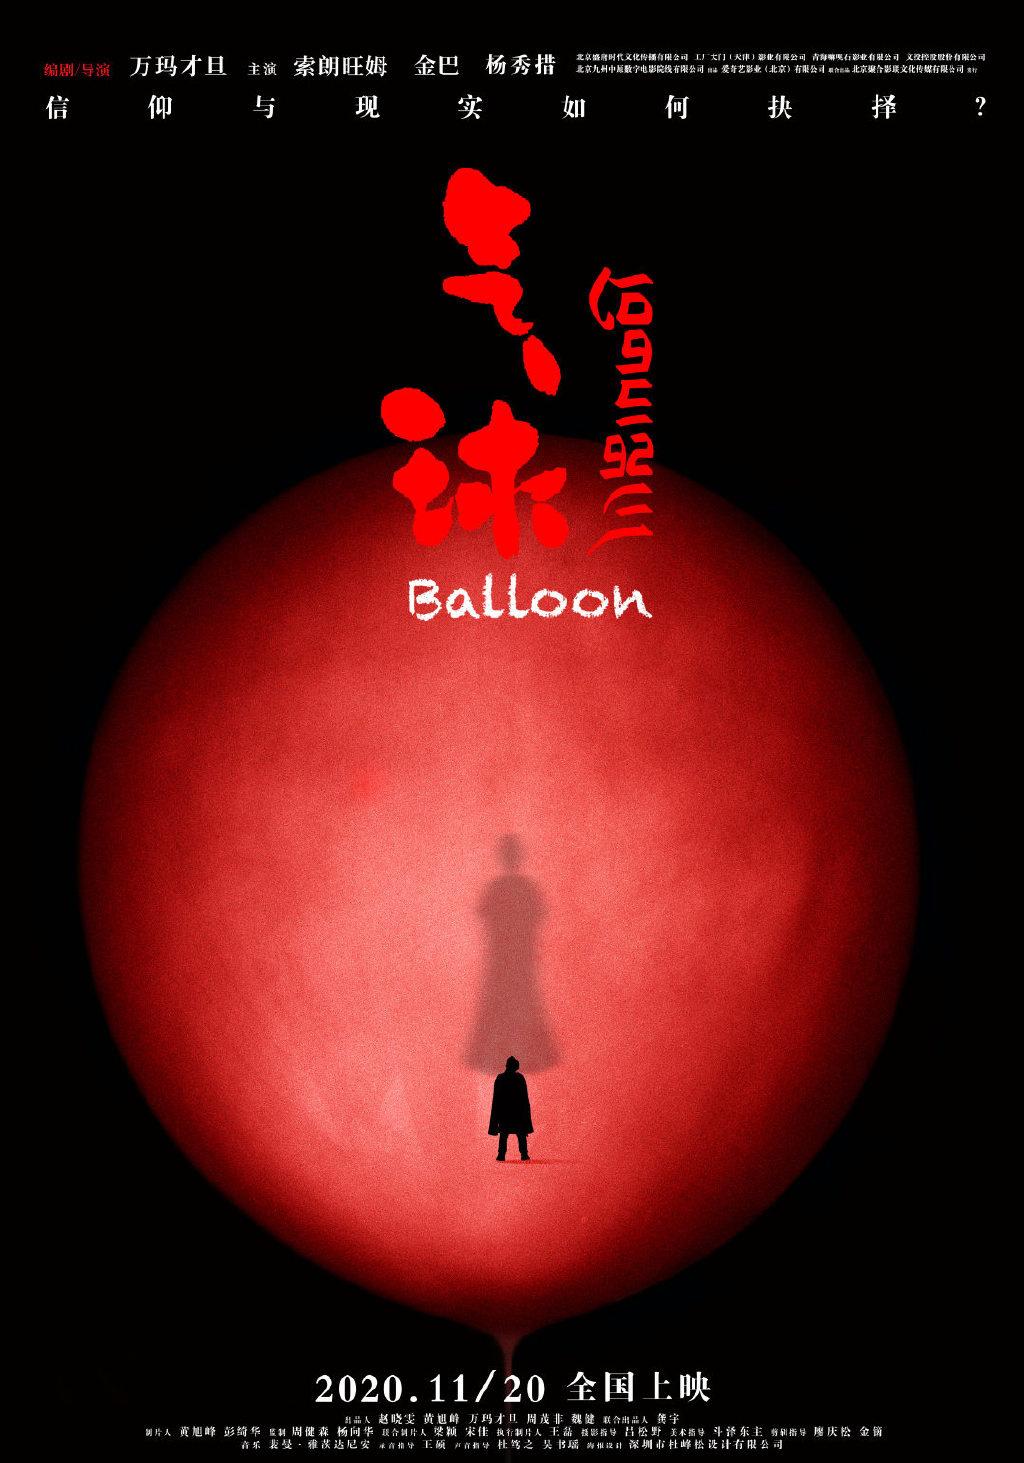 usdt支付平台(caibao.it):《气球》排片跌至1% 万玛才旦呼吁公正看待影戏 第2张